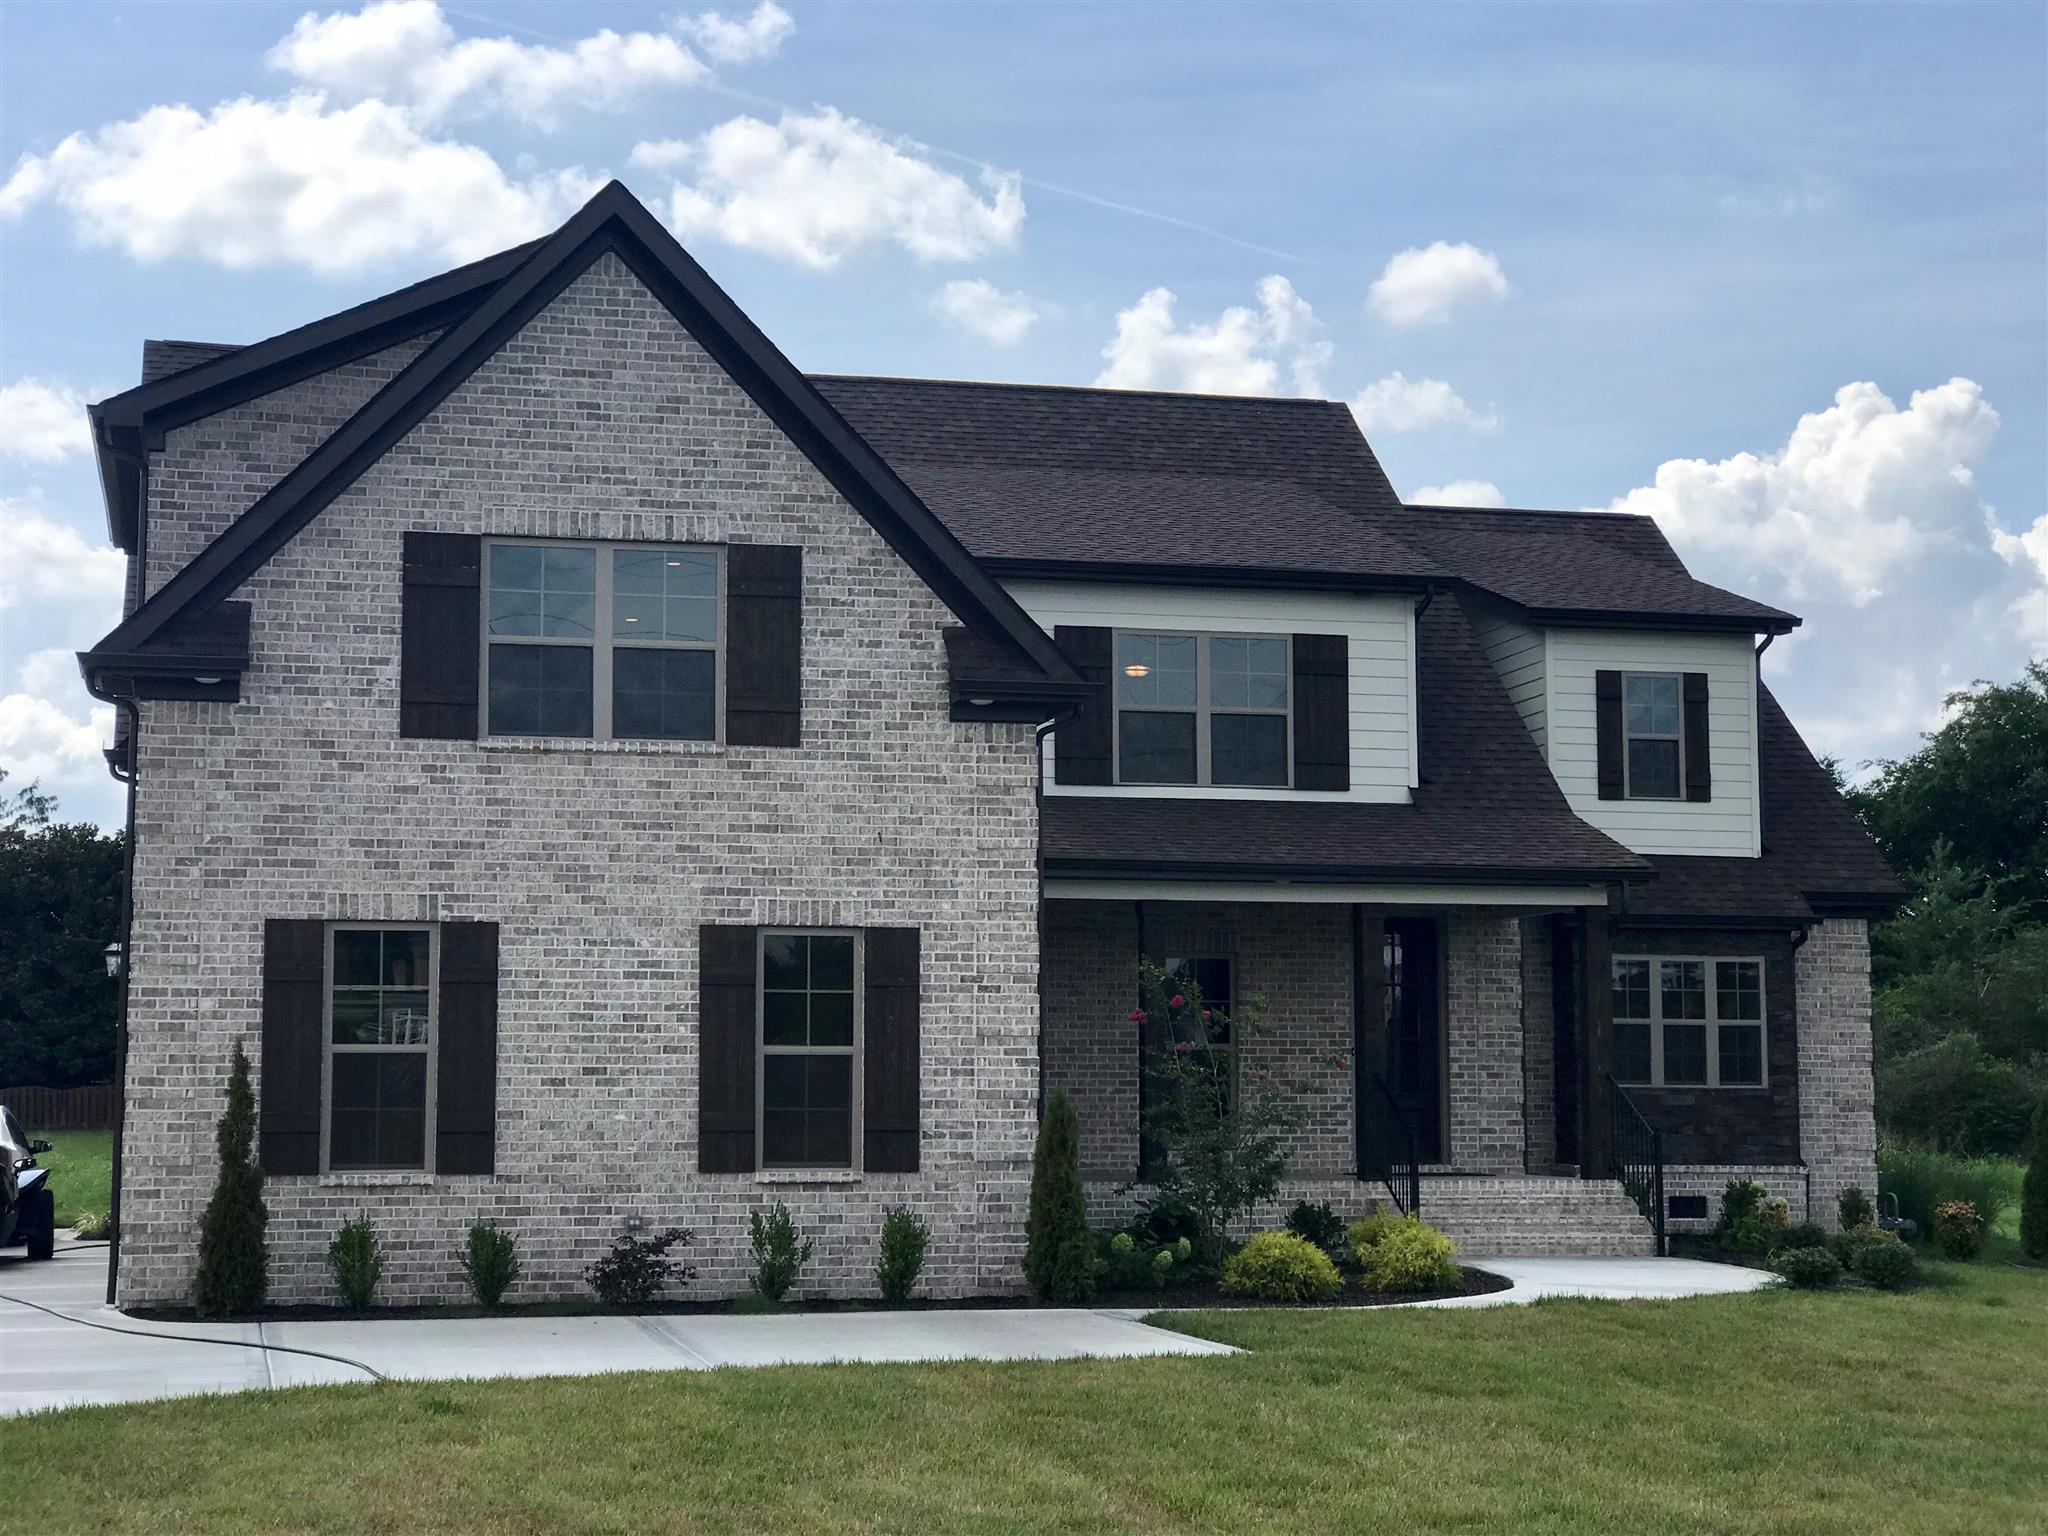 2949 Siegel Rd, Murfreesboro, TN 37129 - Murfreesboro, TN real estate listing